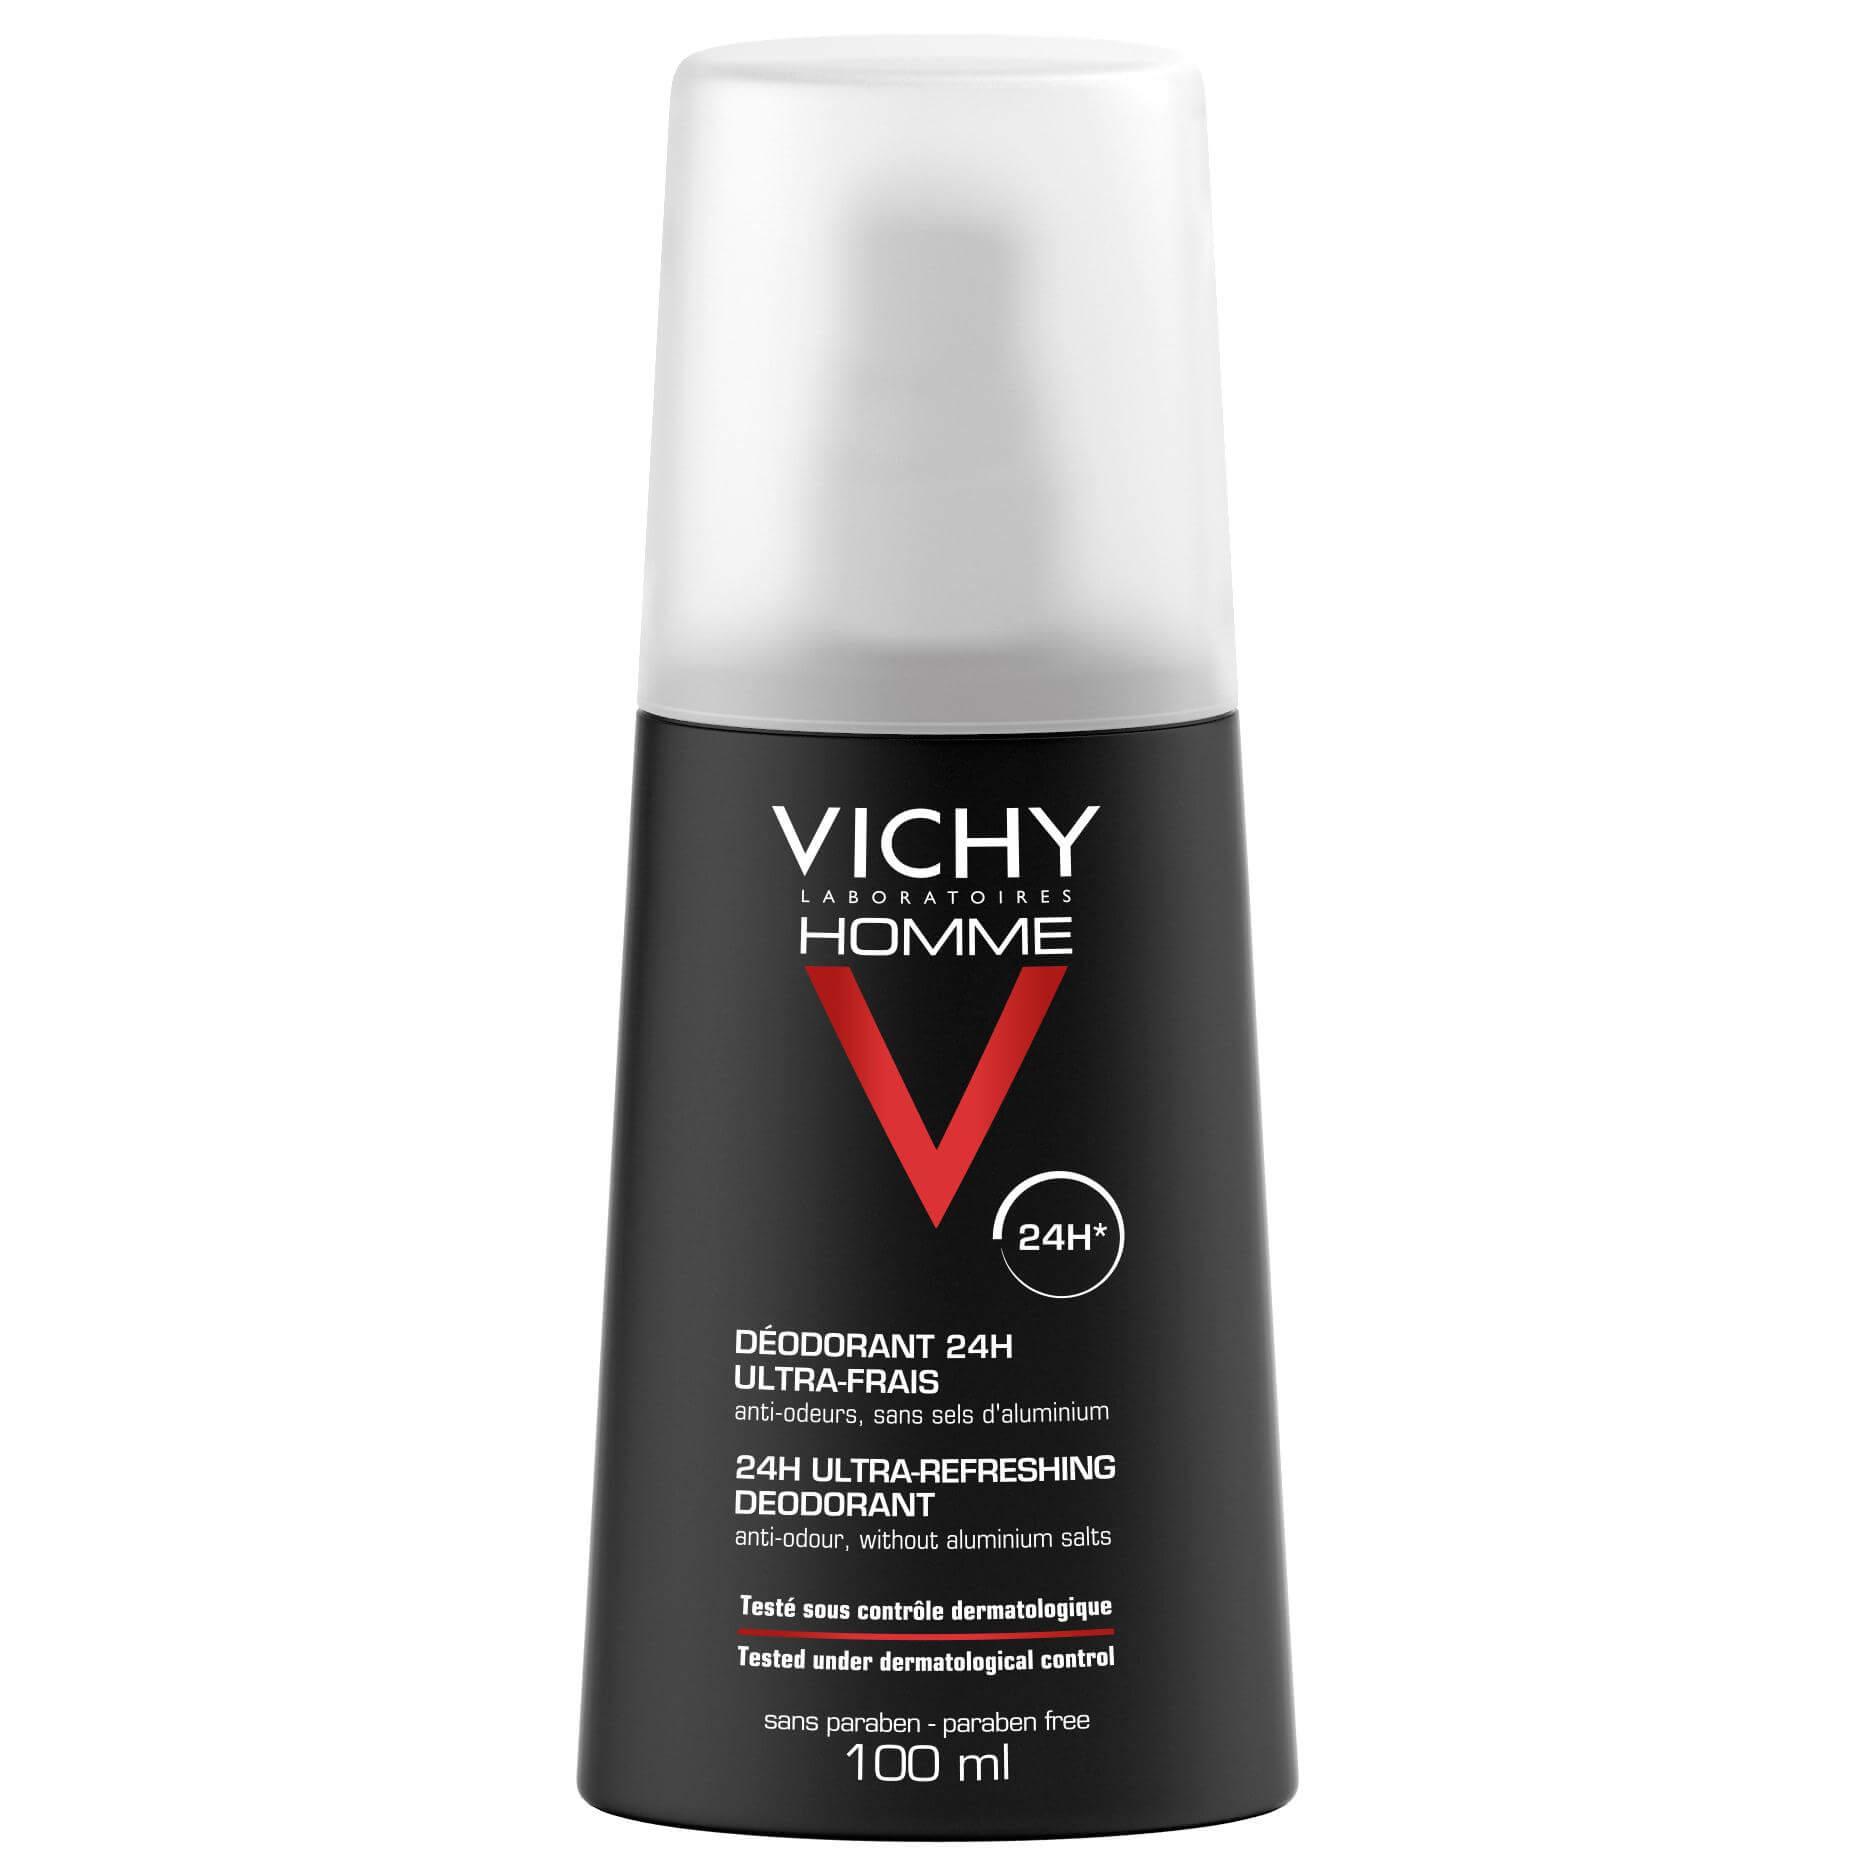 Vichy Homme Deodorant Ultra Frais Vaporisateur για τον Άντρα Σε Μορφή Spray 100ml